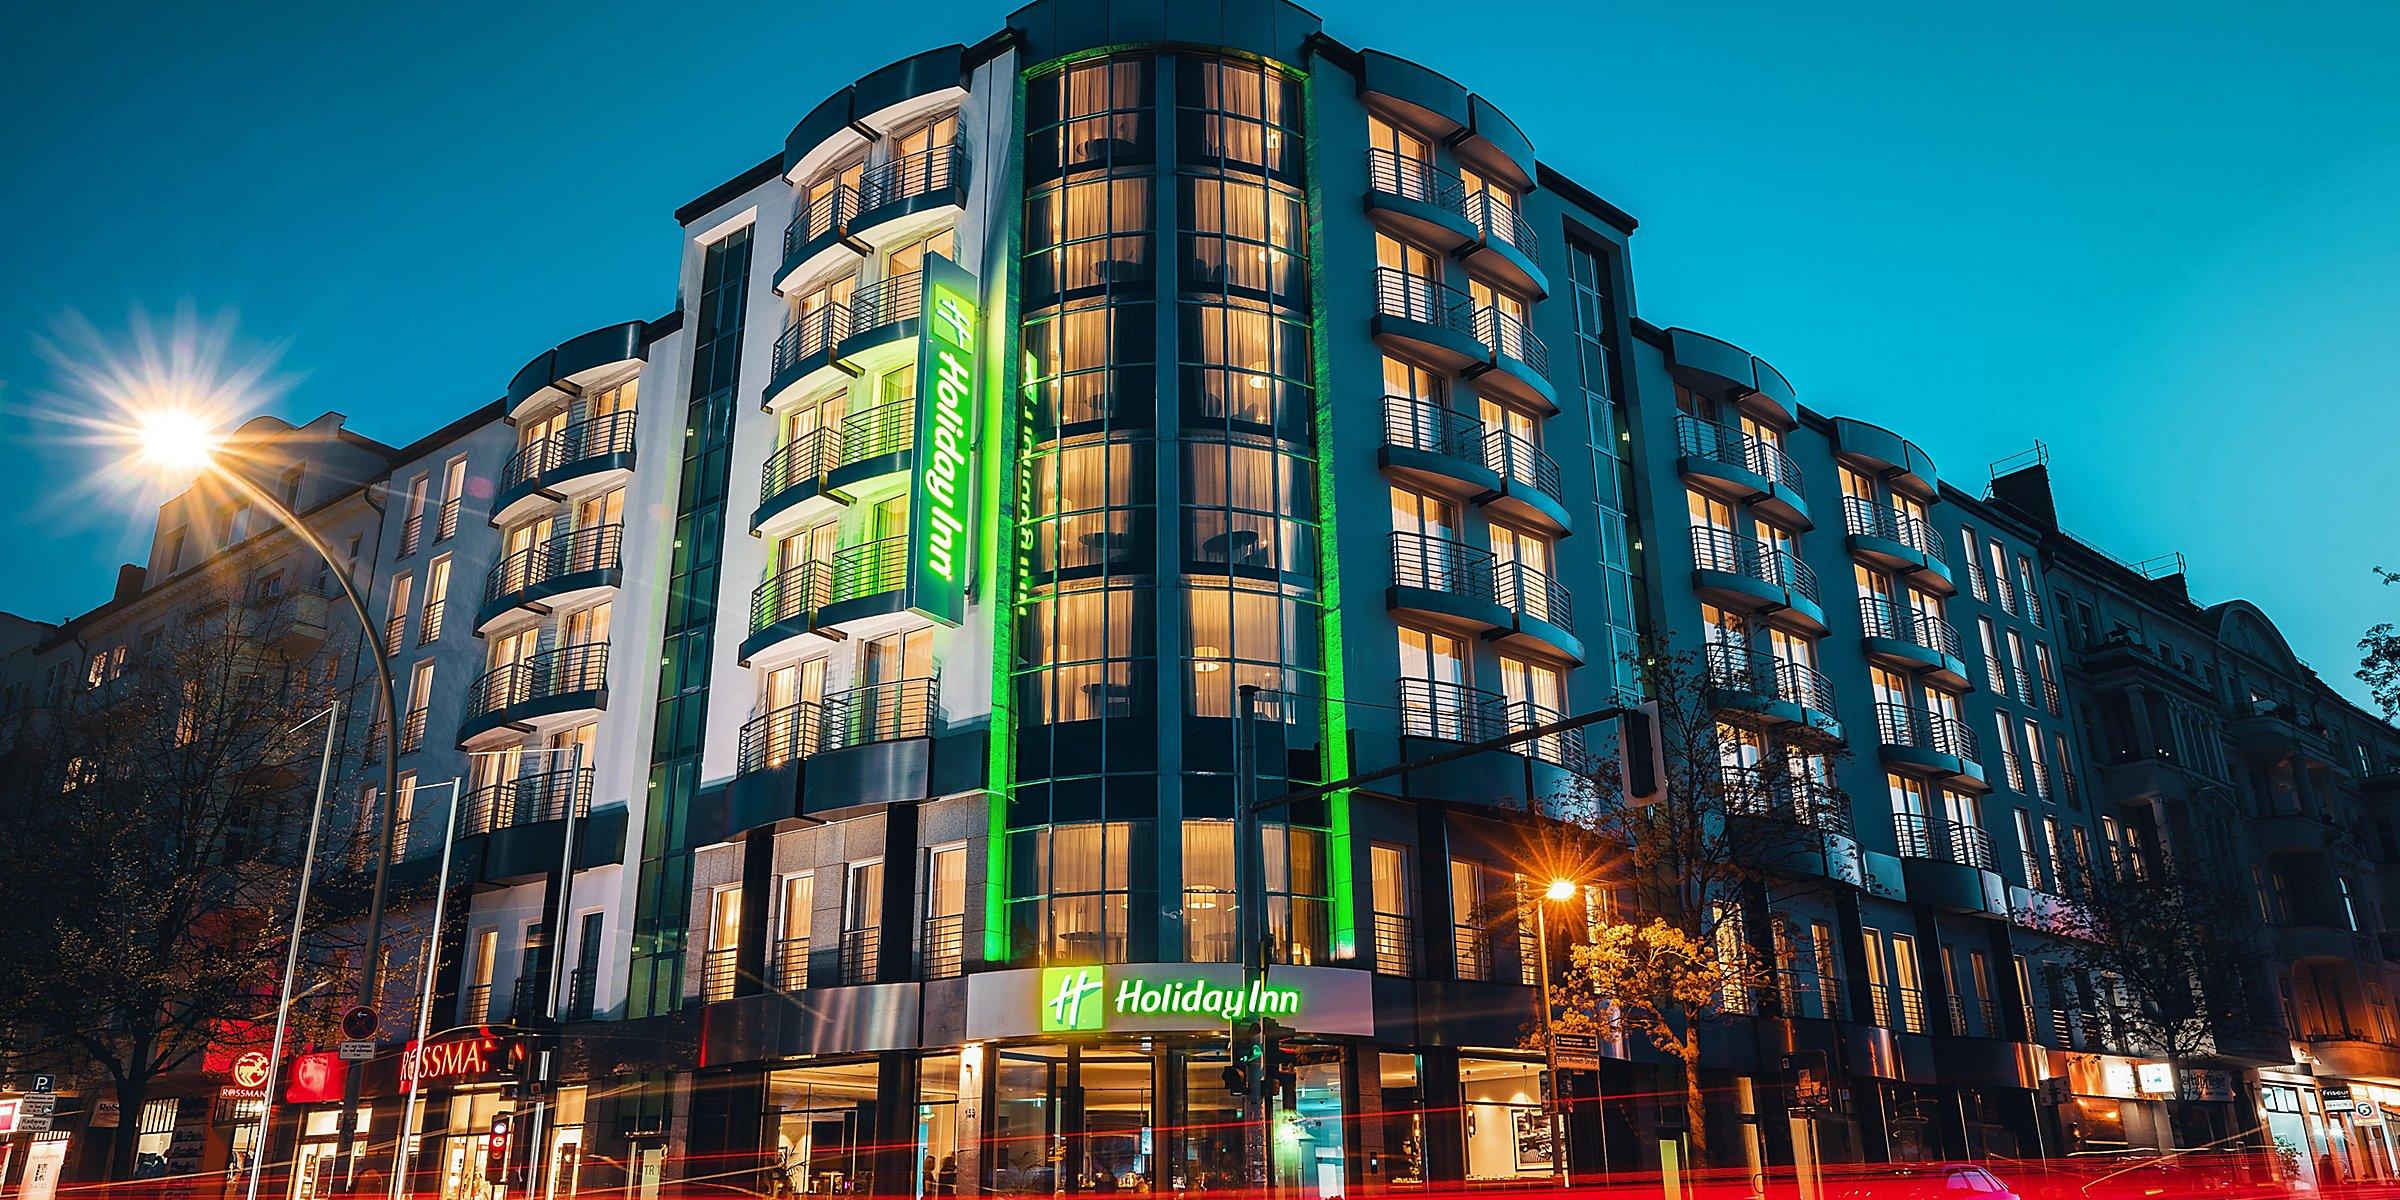 Hotels In Prenzlauer Berg Berlin Holiday Inn Berlin City